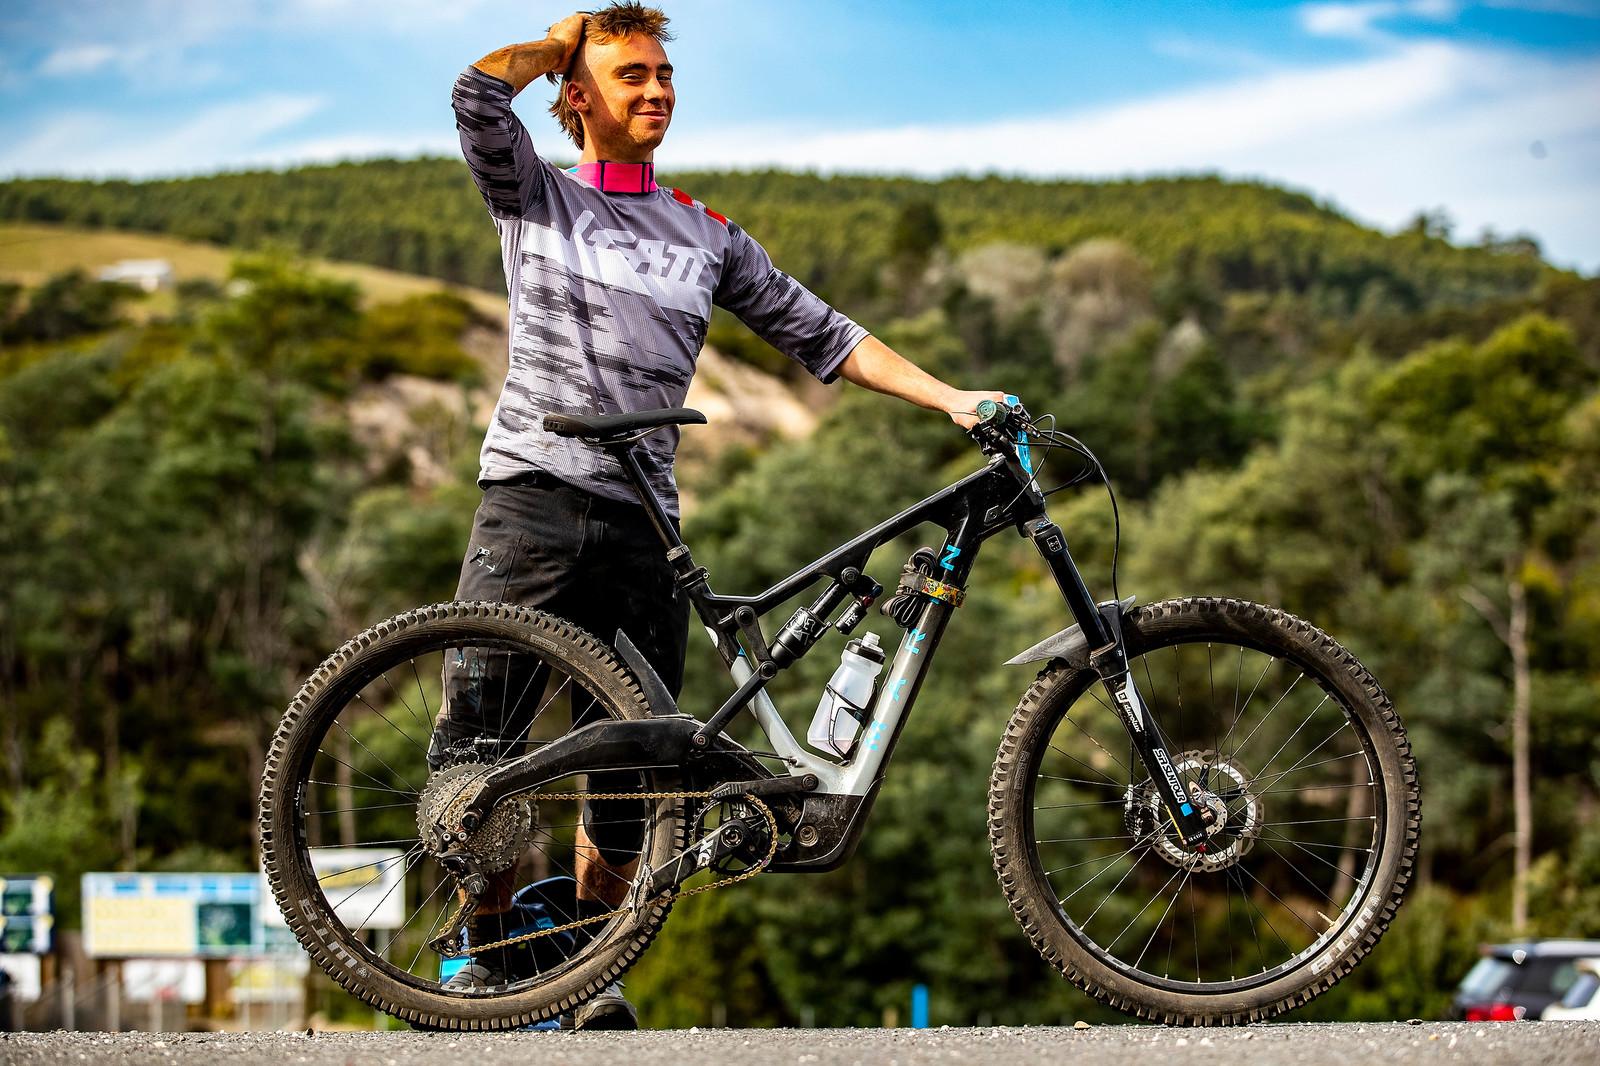 Matt Koen's Mount Vision - What's Stock, What's Not - Tasmania Enduro World Series - Mountain Biking Pictures - Vital MTB